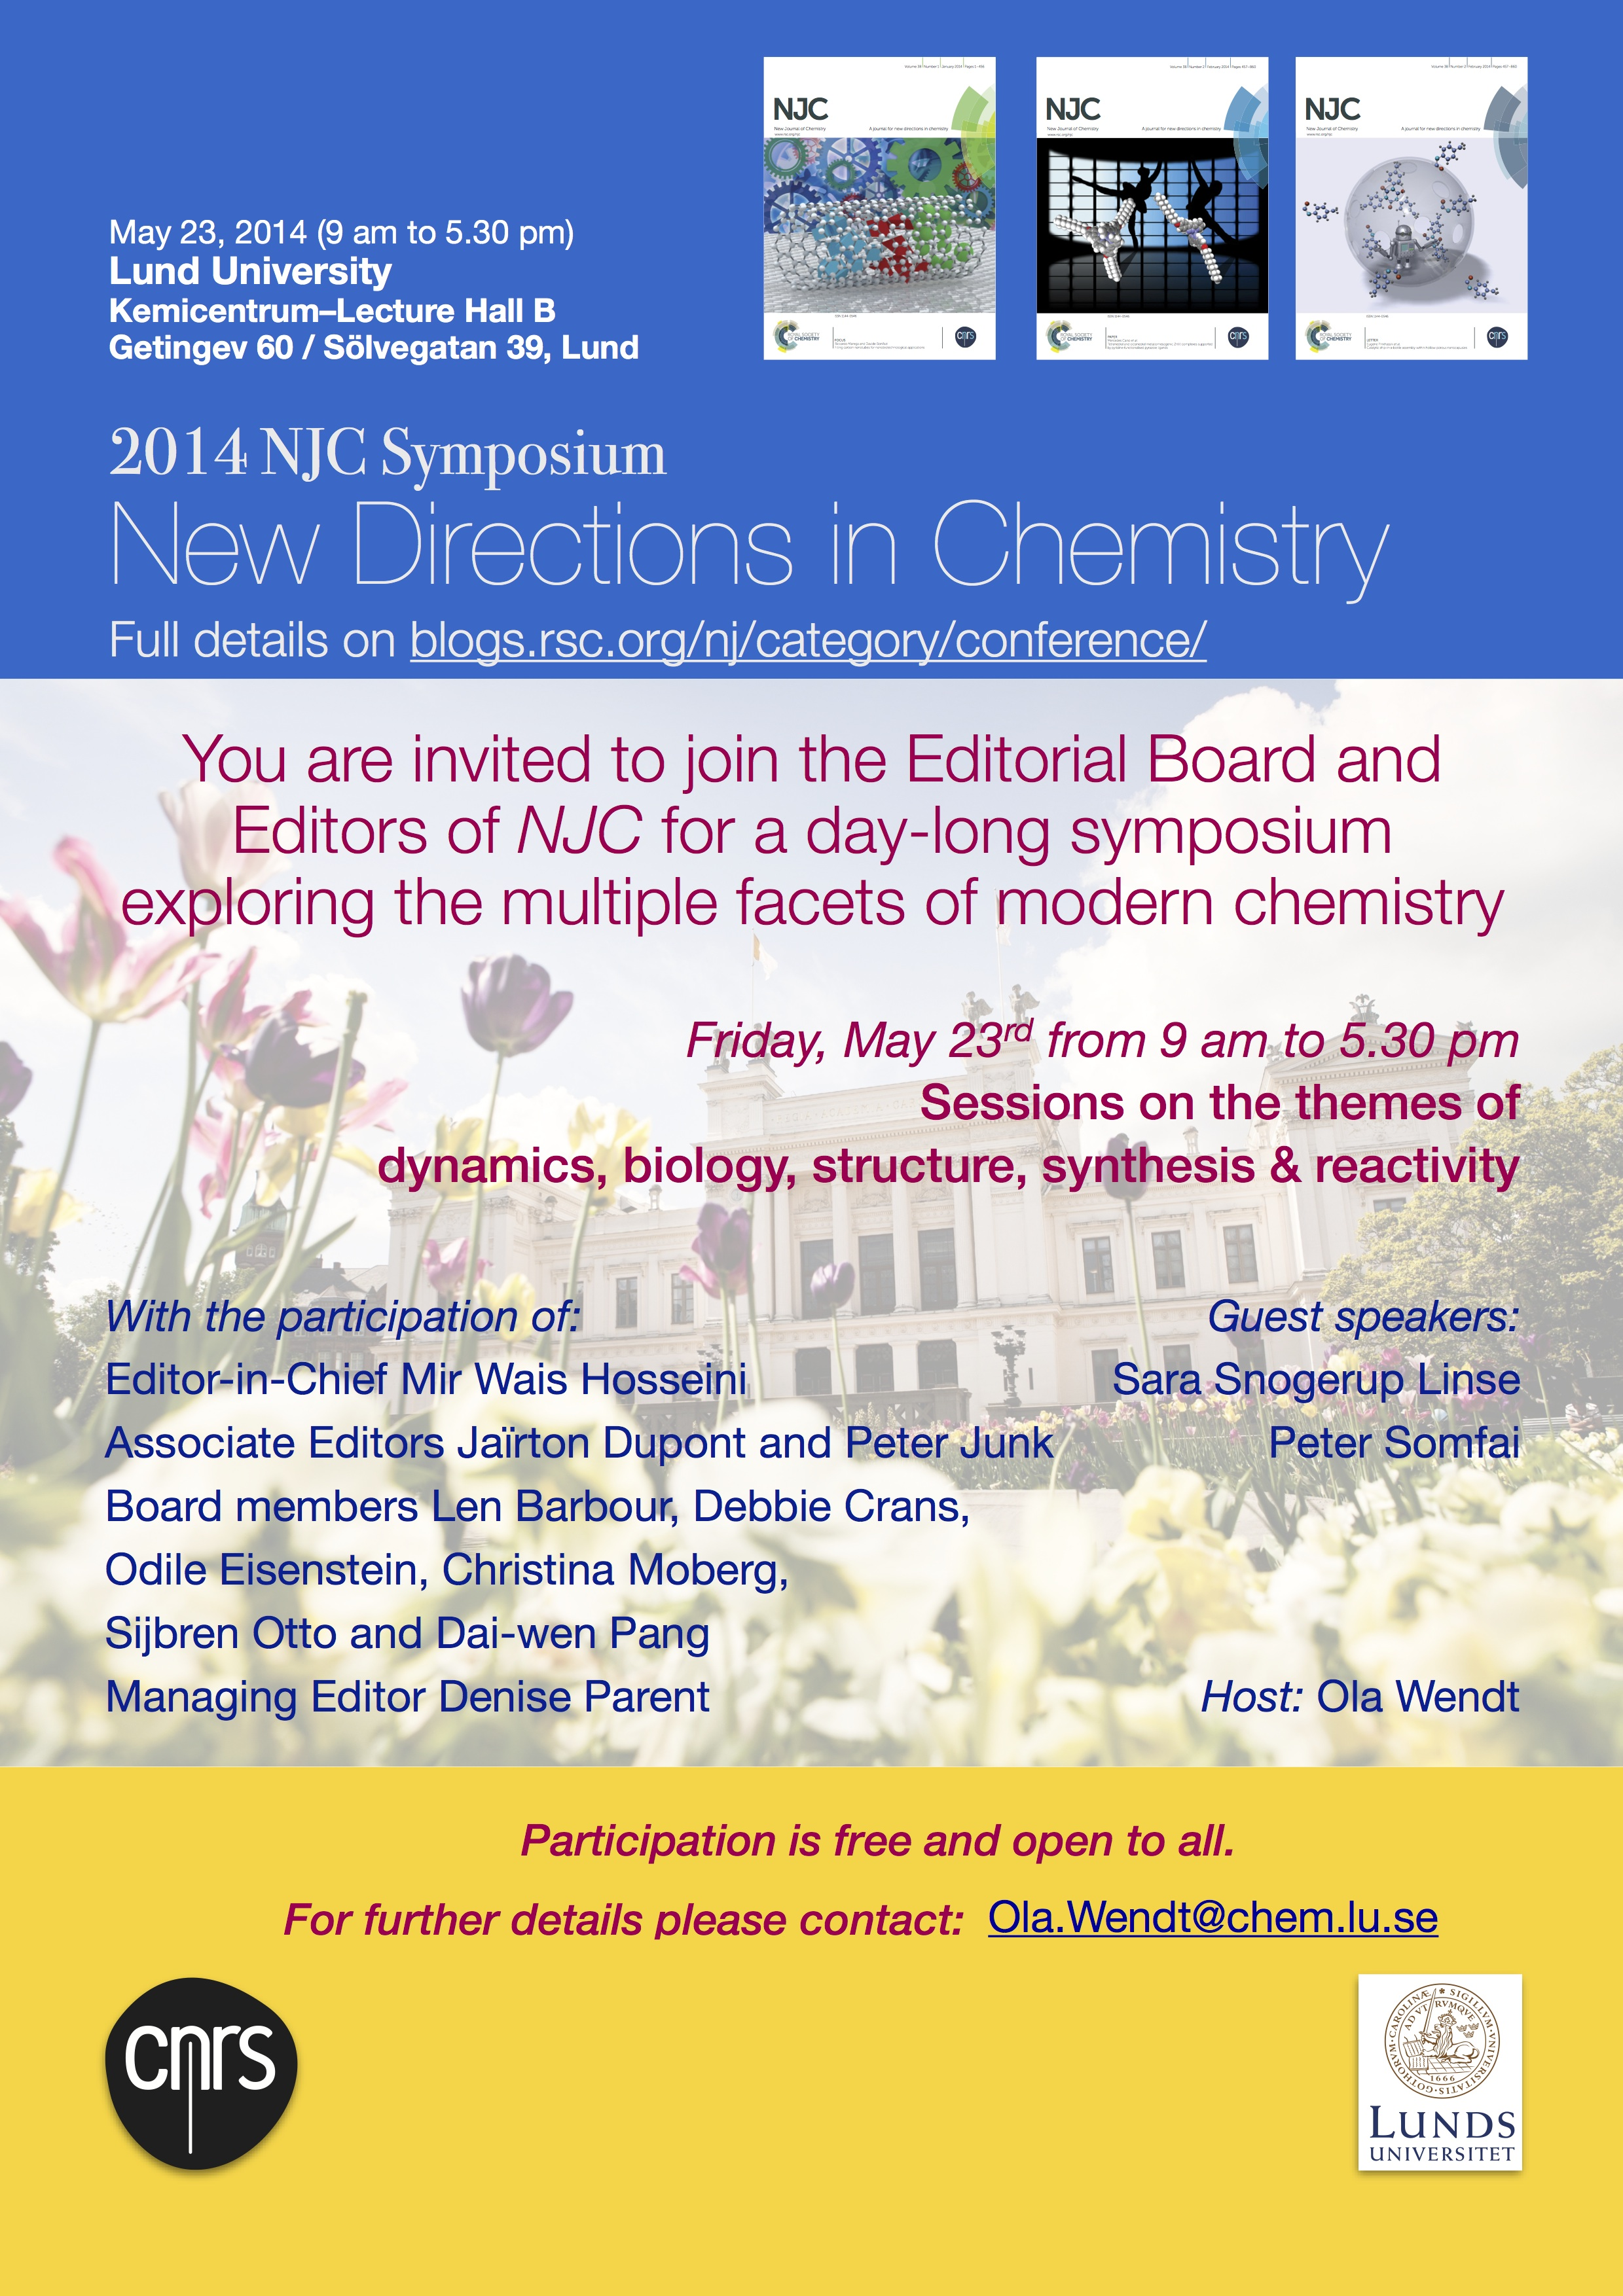 NJC Symposium at Lund University on May 23, 2014